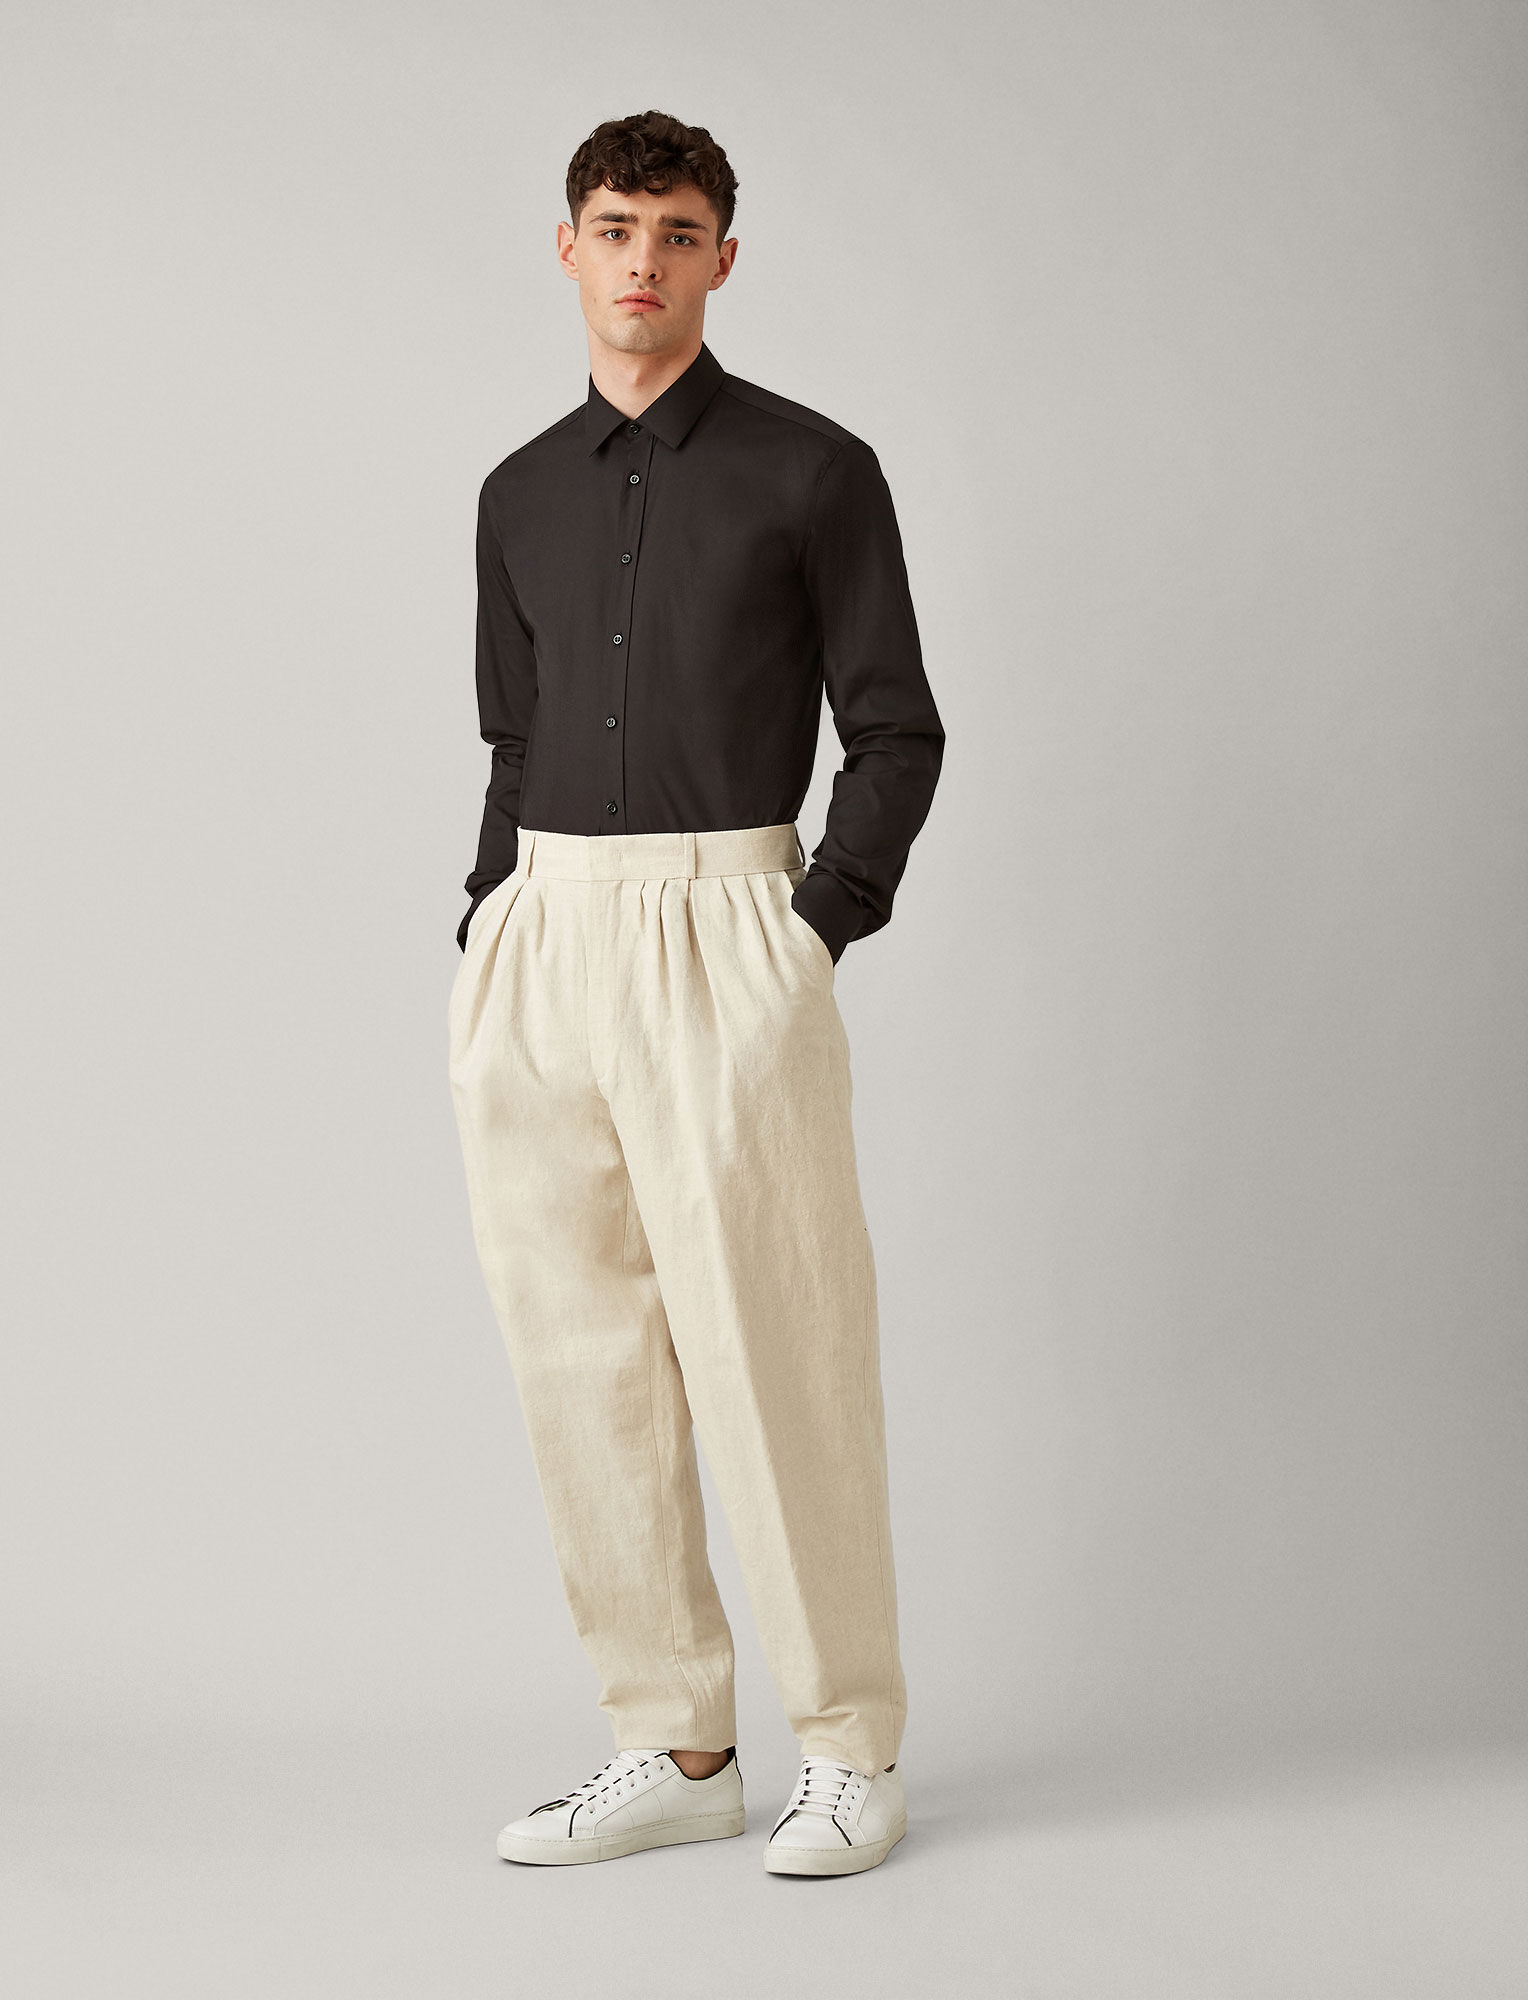 Joseph, Jim Poplin Stretch Shirt, in BLACK